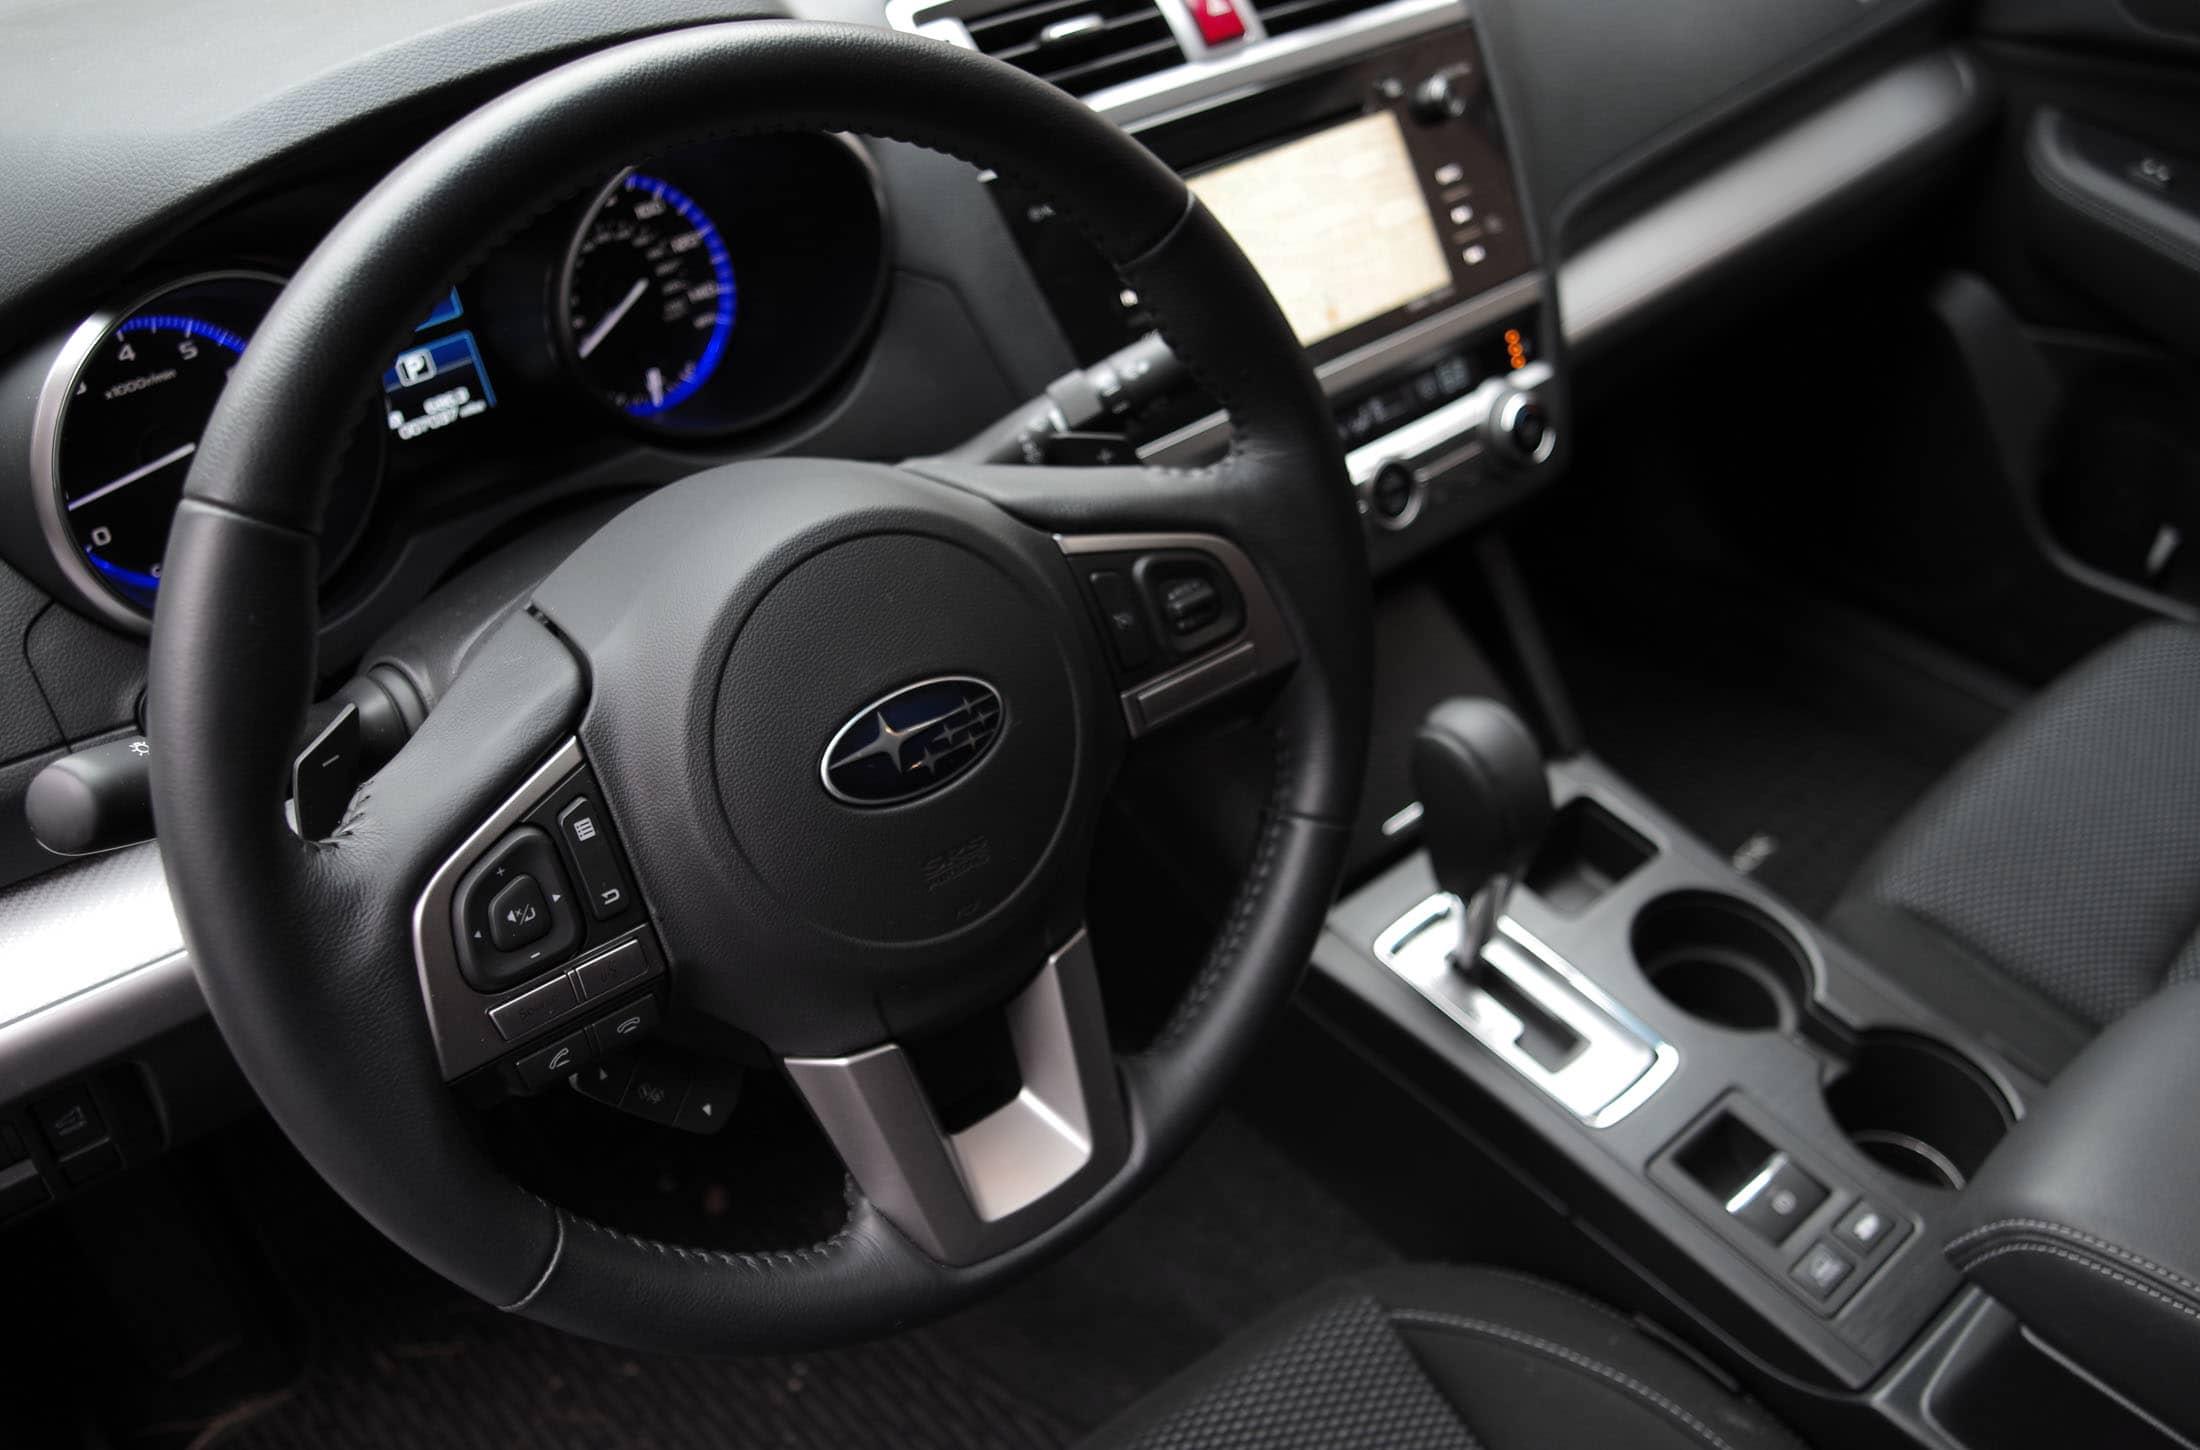 2015 Subaru Outback driver's view